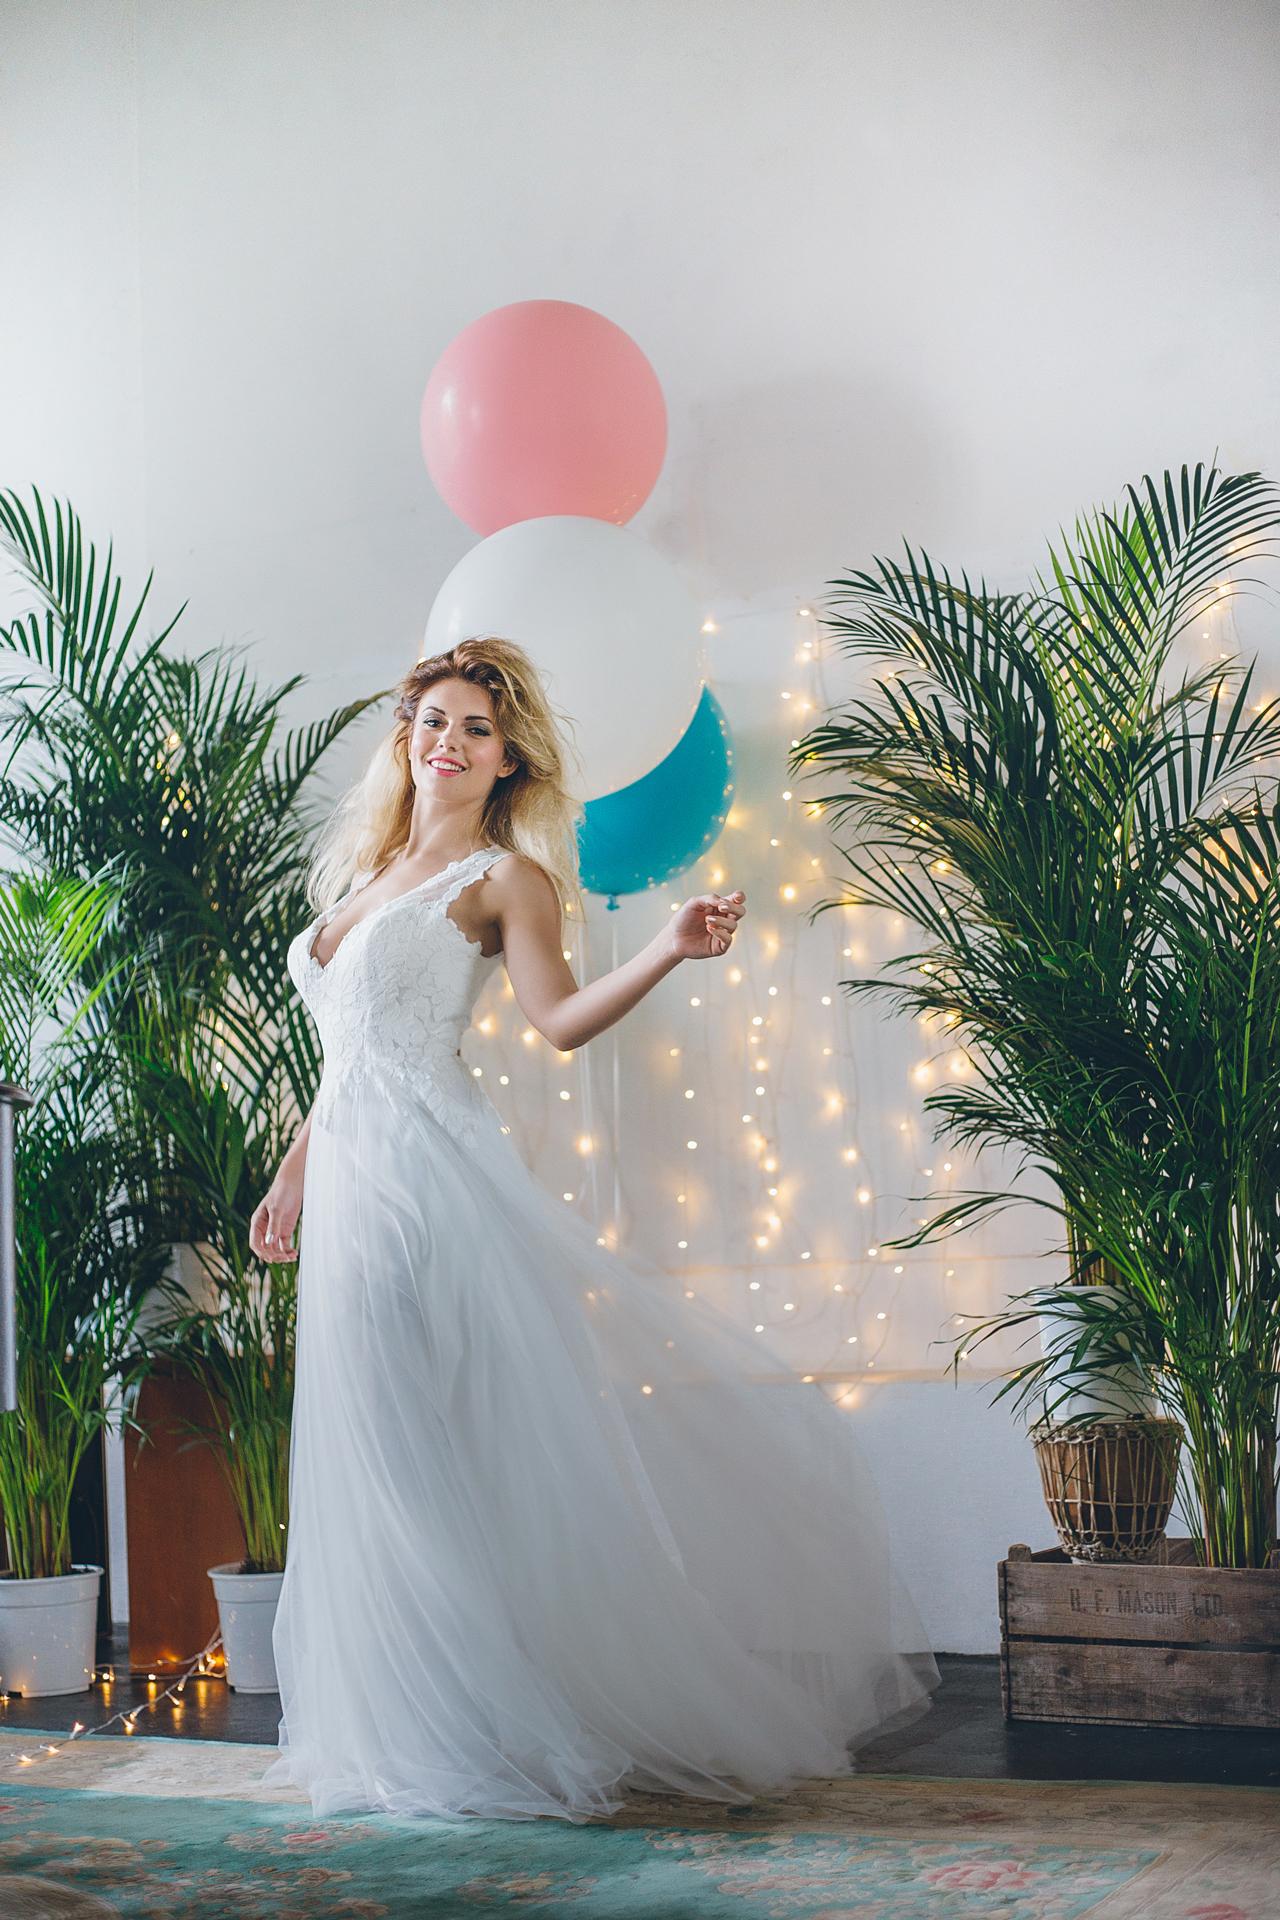 norfolk_wedding_photographer _norwich_anglia_documentary_reportage_storybook (25).jpg